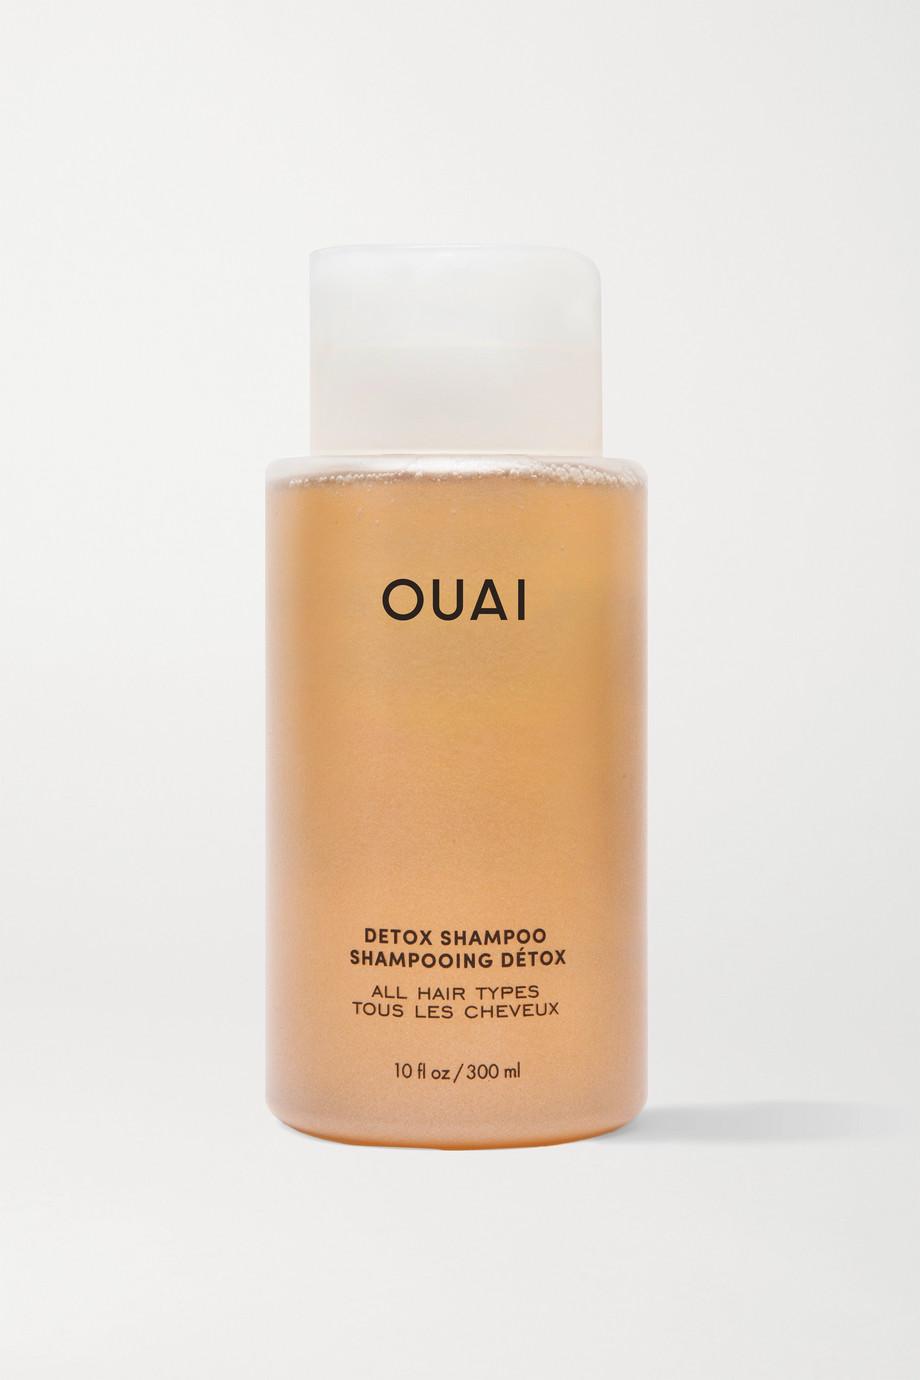 OUAI Haircare Detox Shampoo, 300 ml – Shampoo